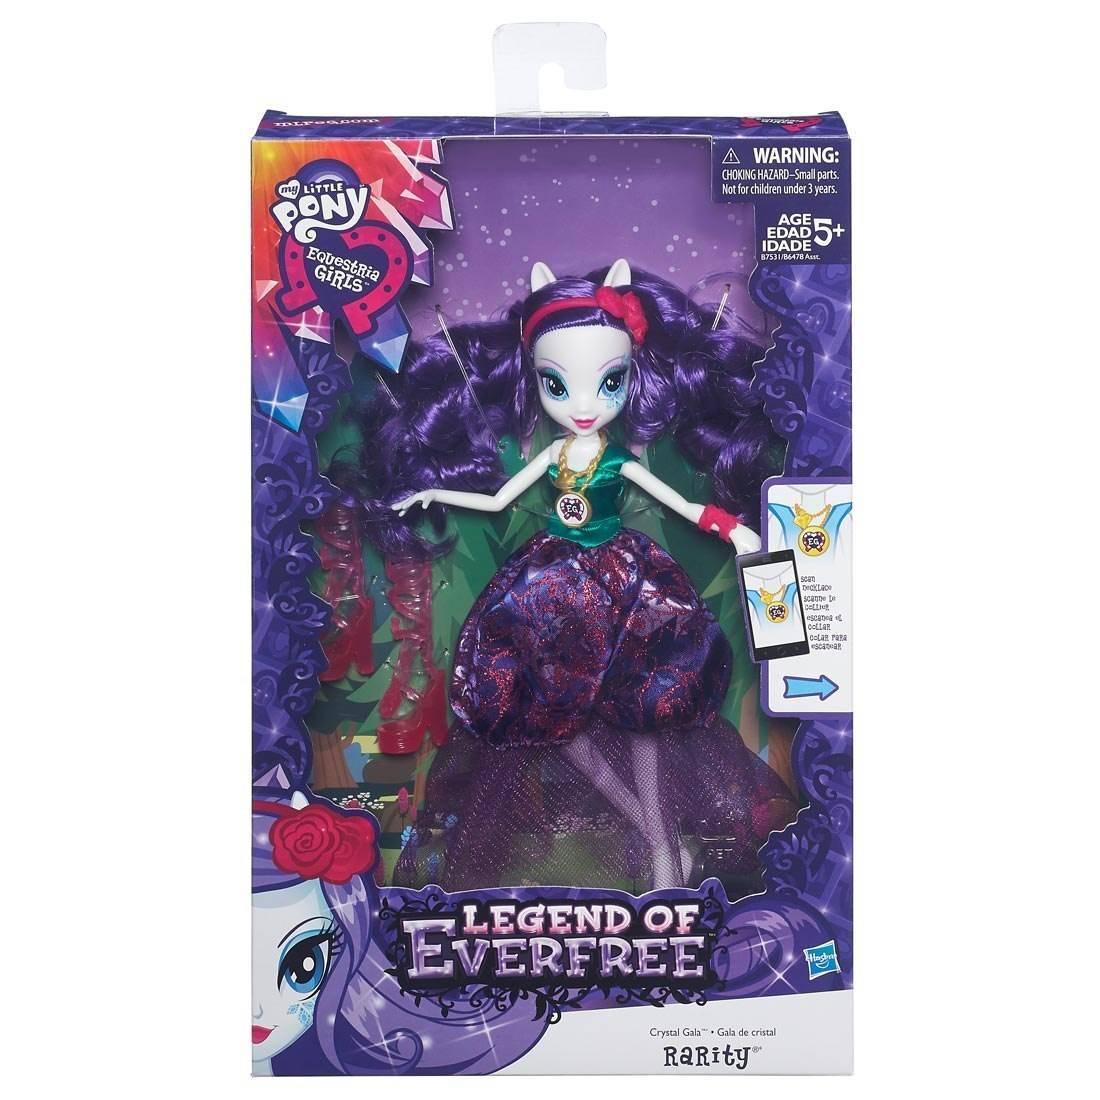 Rarity Luxo Gala de Cristal My Little Pony - Hasbro B7531 - Noy Brinquedos